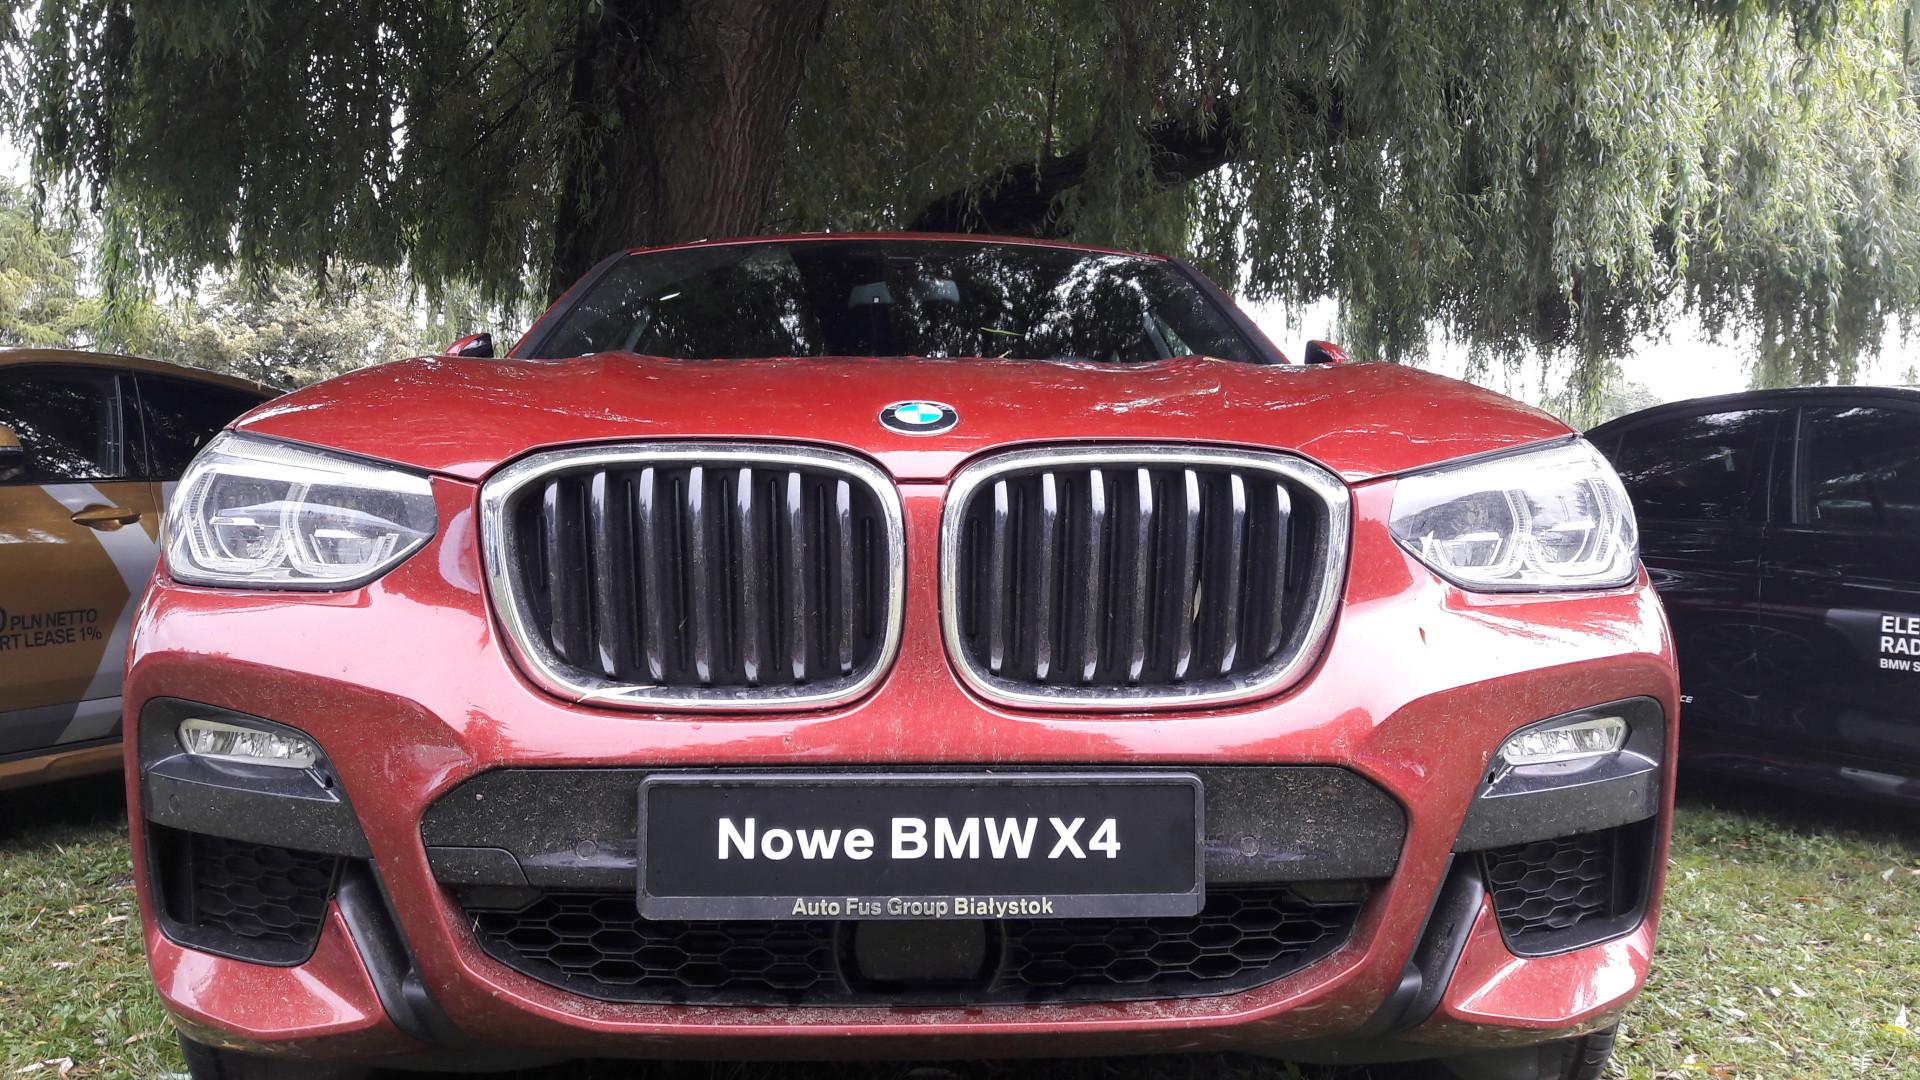 Siemiatycze MeeUp_Inter Cars (19).jpg